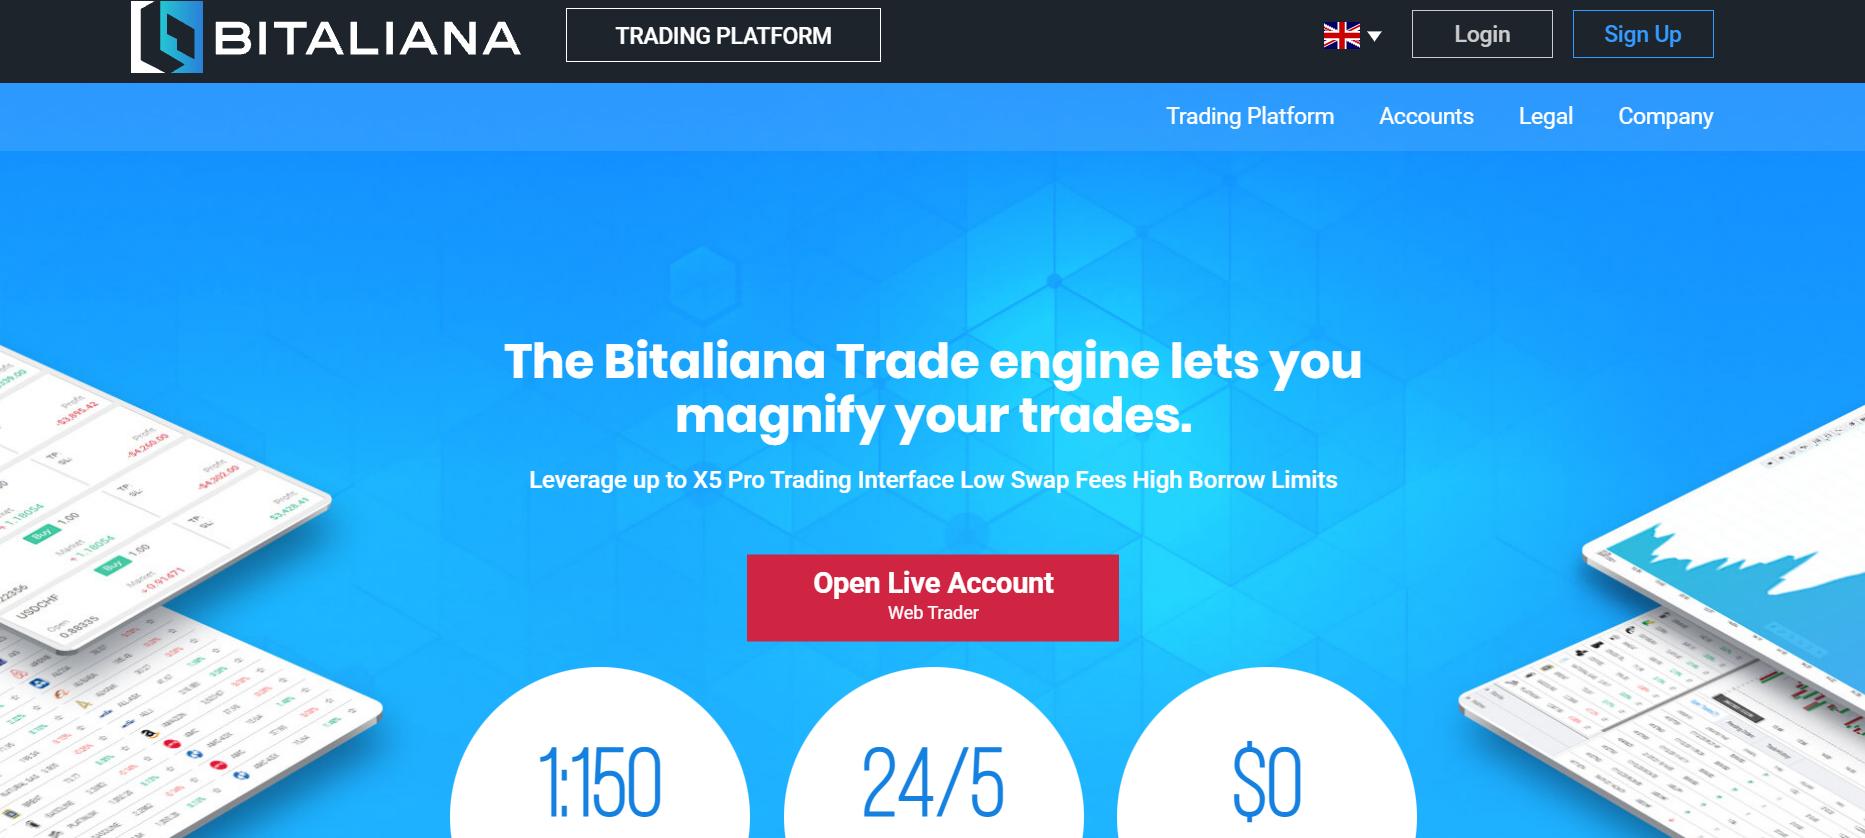 Bitaliana – Can You Trust Them?